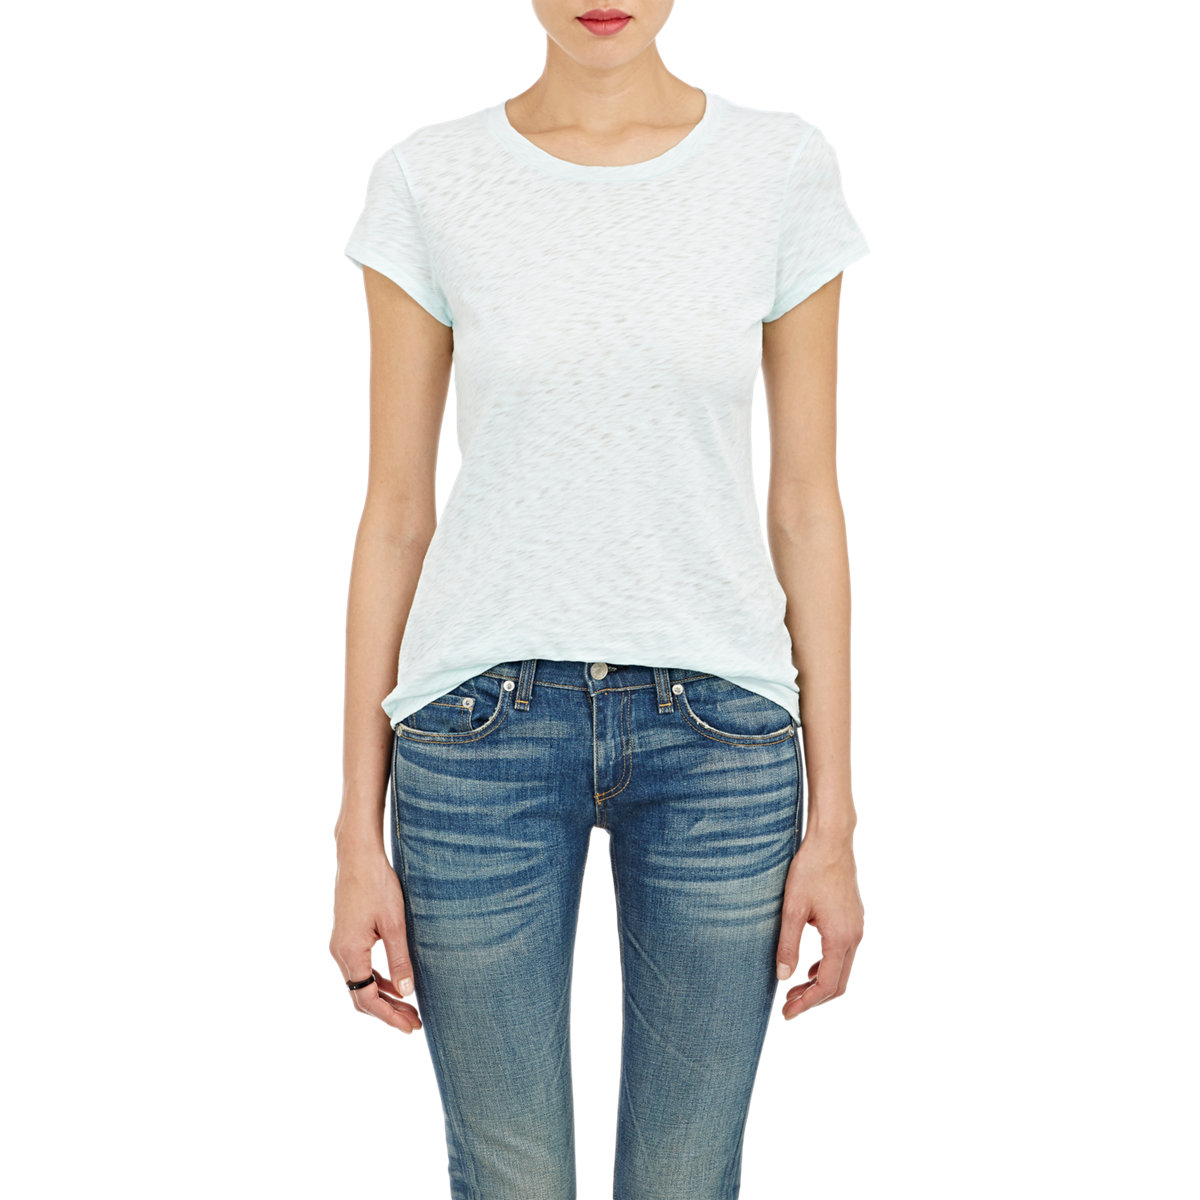 Rag bone slub jersey t shirt in white lyst for Rag and bone t shirts